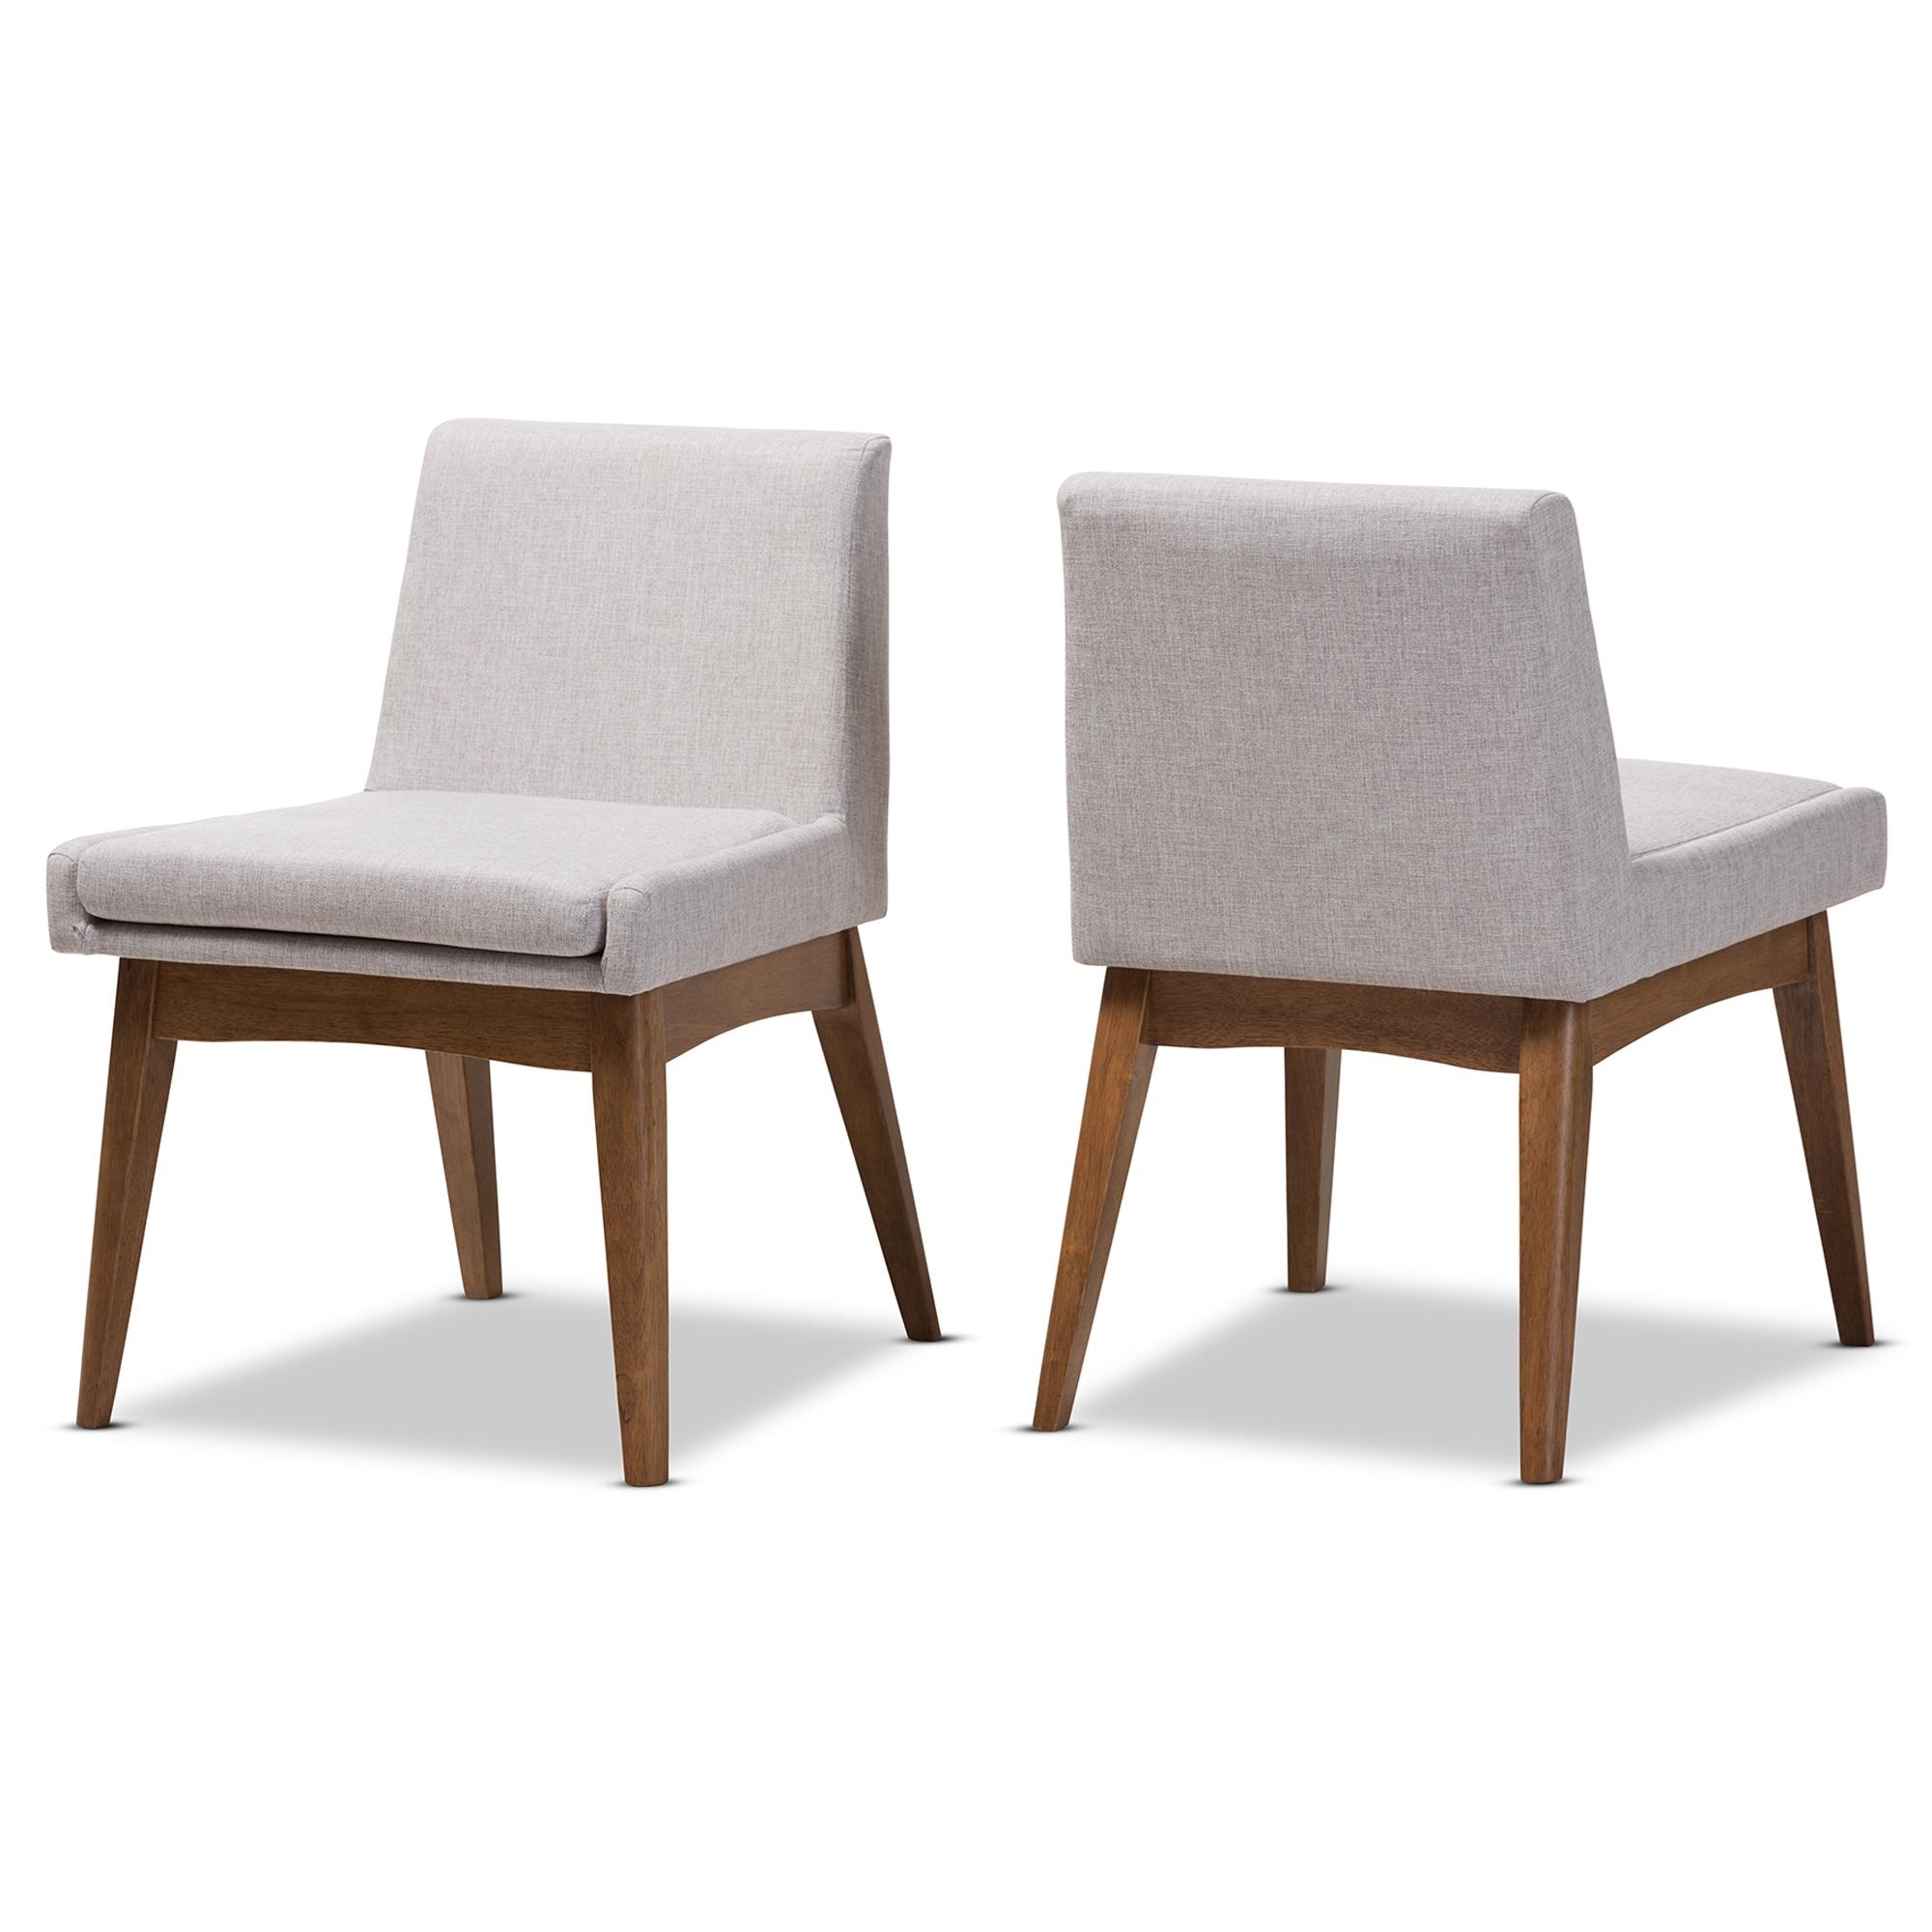 Baxton Studio Nexus Mid Century Modern Walnut Wood Finishing Greyish Beige  Fabric Dining Side Chair